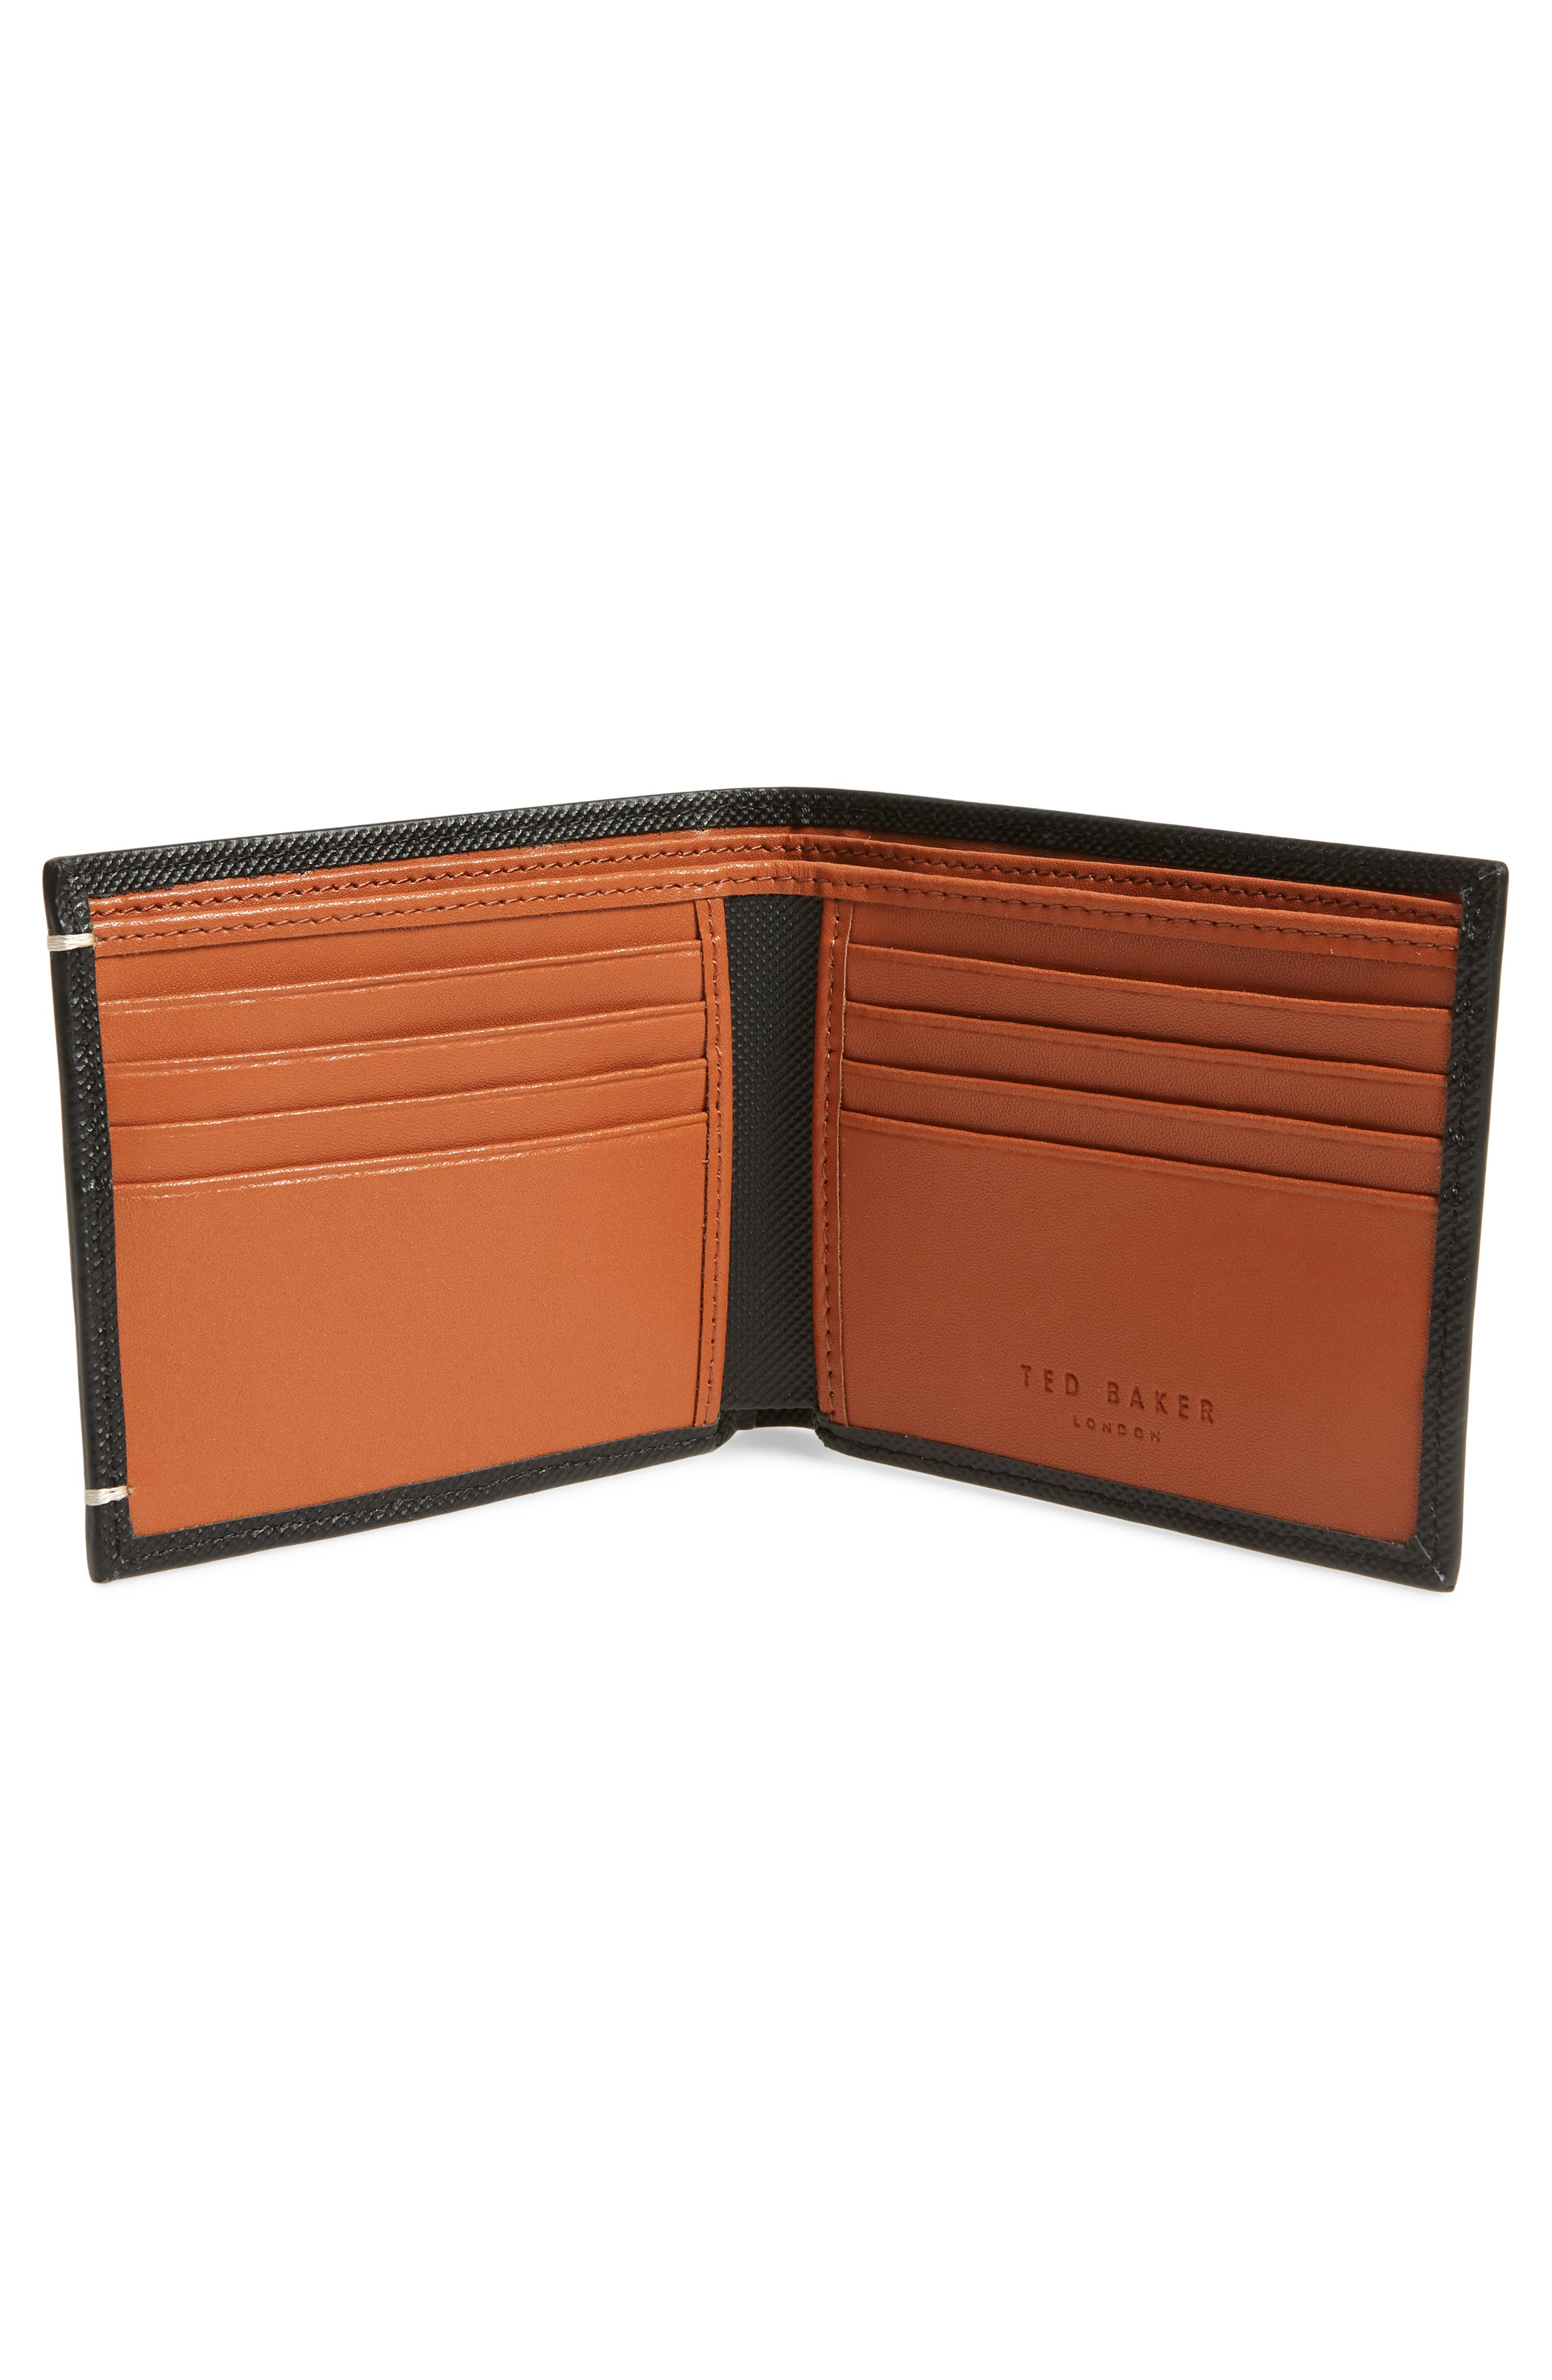 Stormz Leather Wallet,                             Alternate thumbnail 2, color,                             BLACK